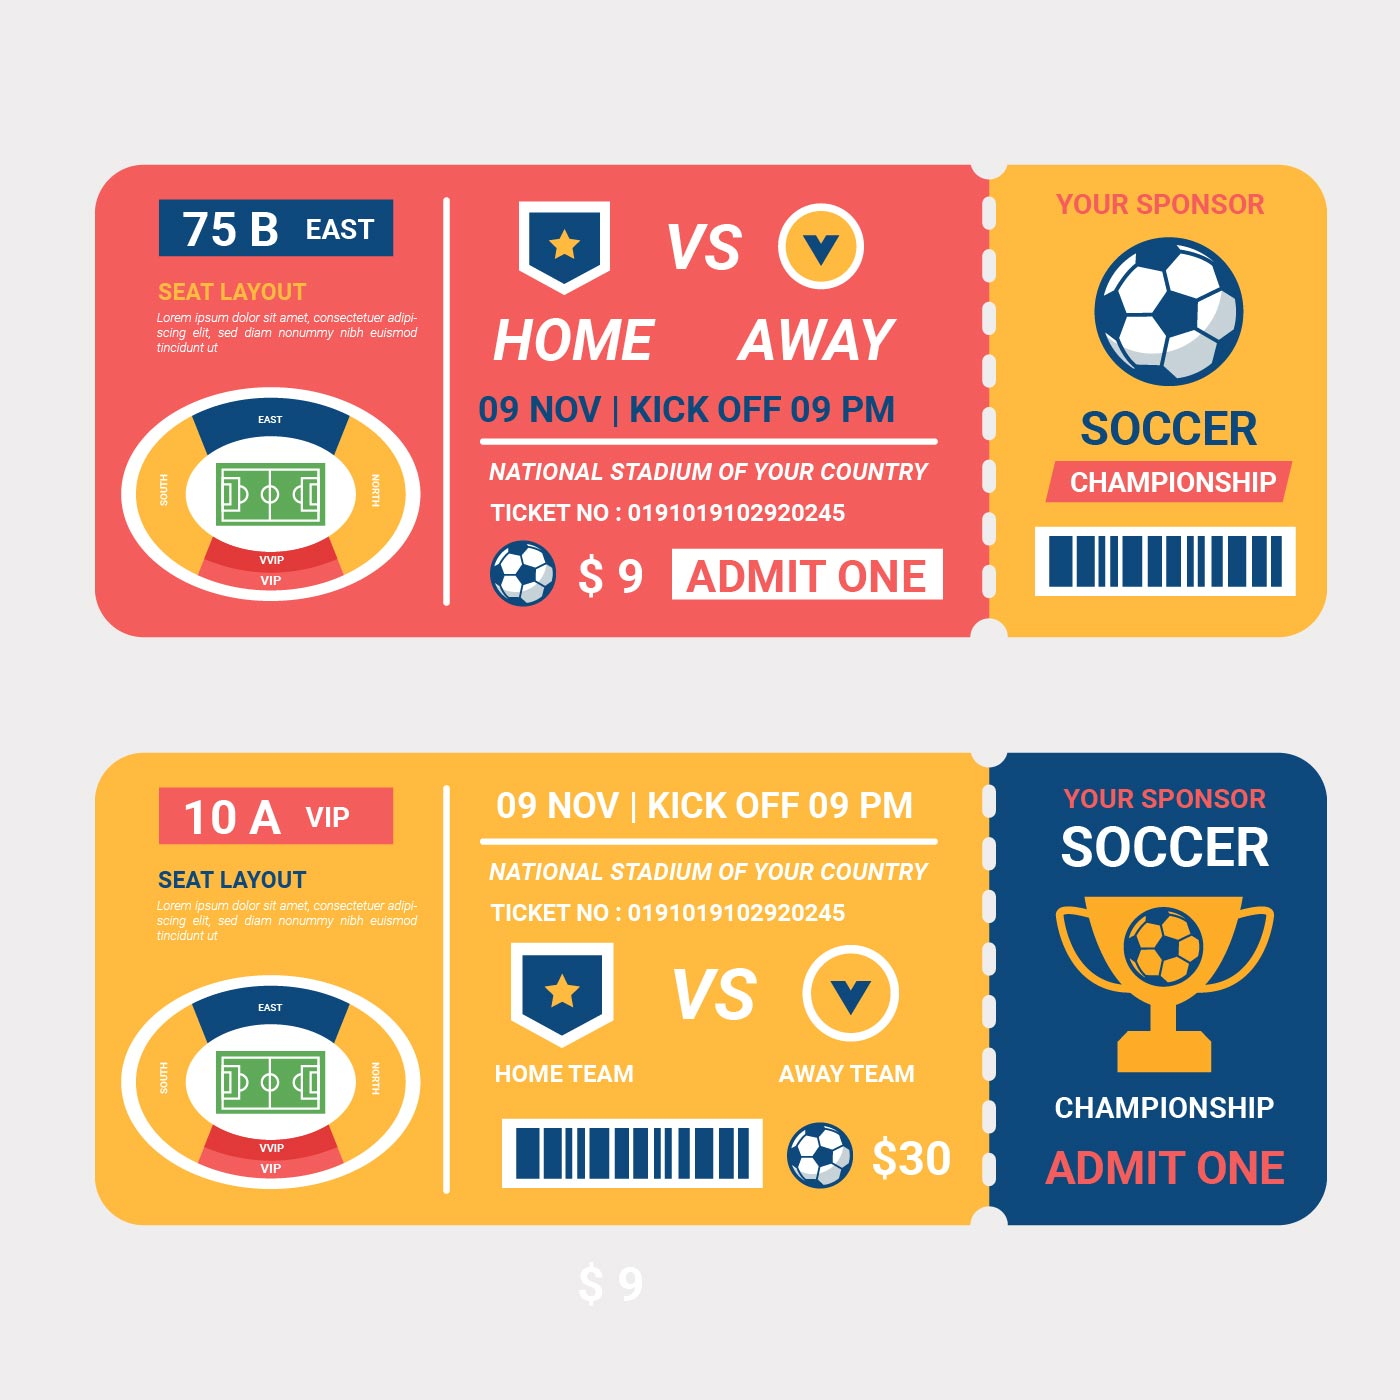 Fußball-Championship-Ticket-Vektor - Kostenlose Vektor-Kunst, Archiv ...